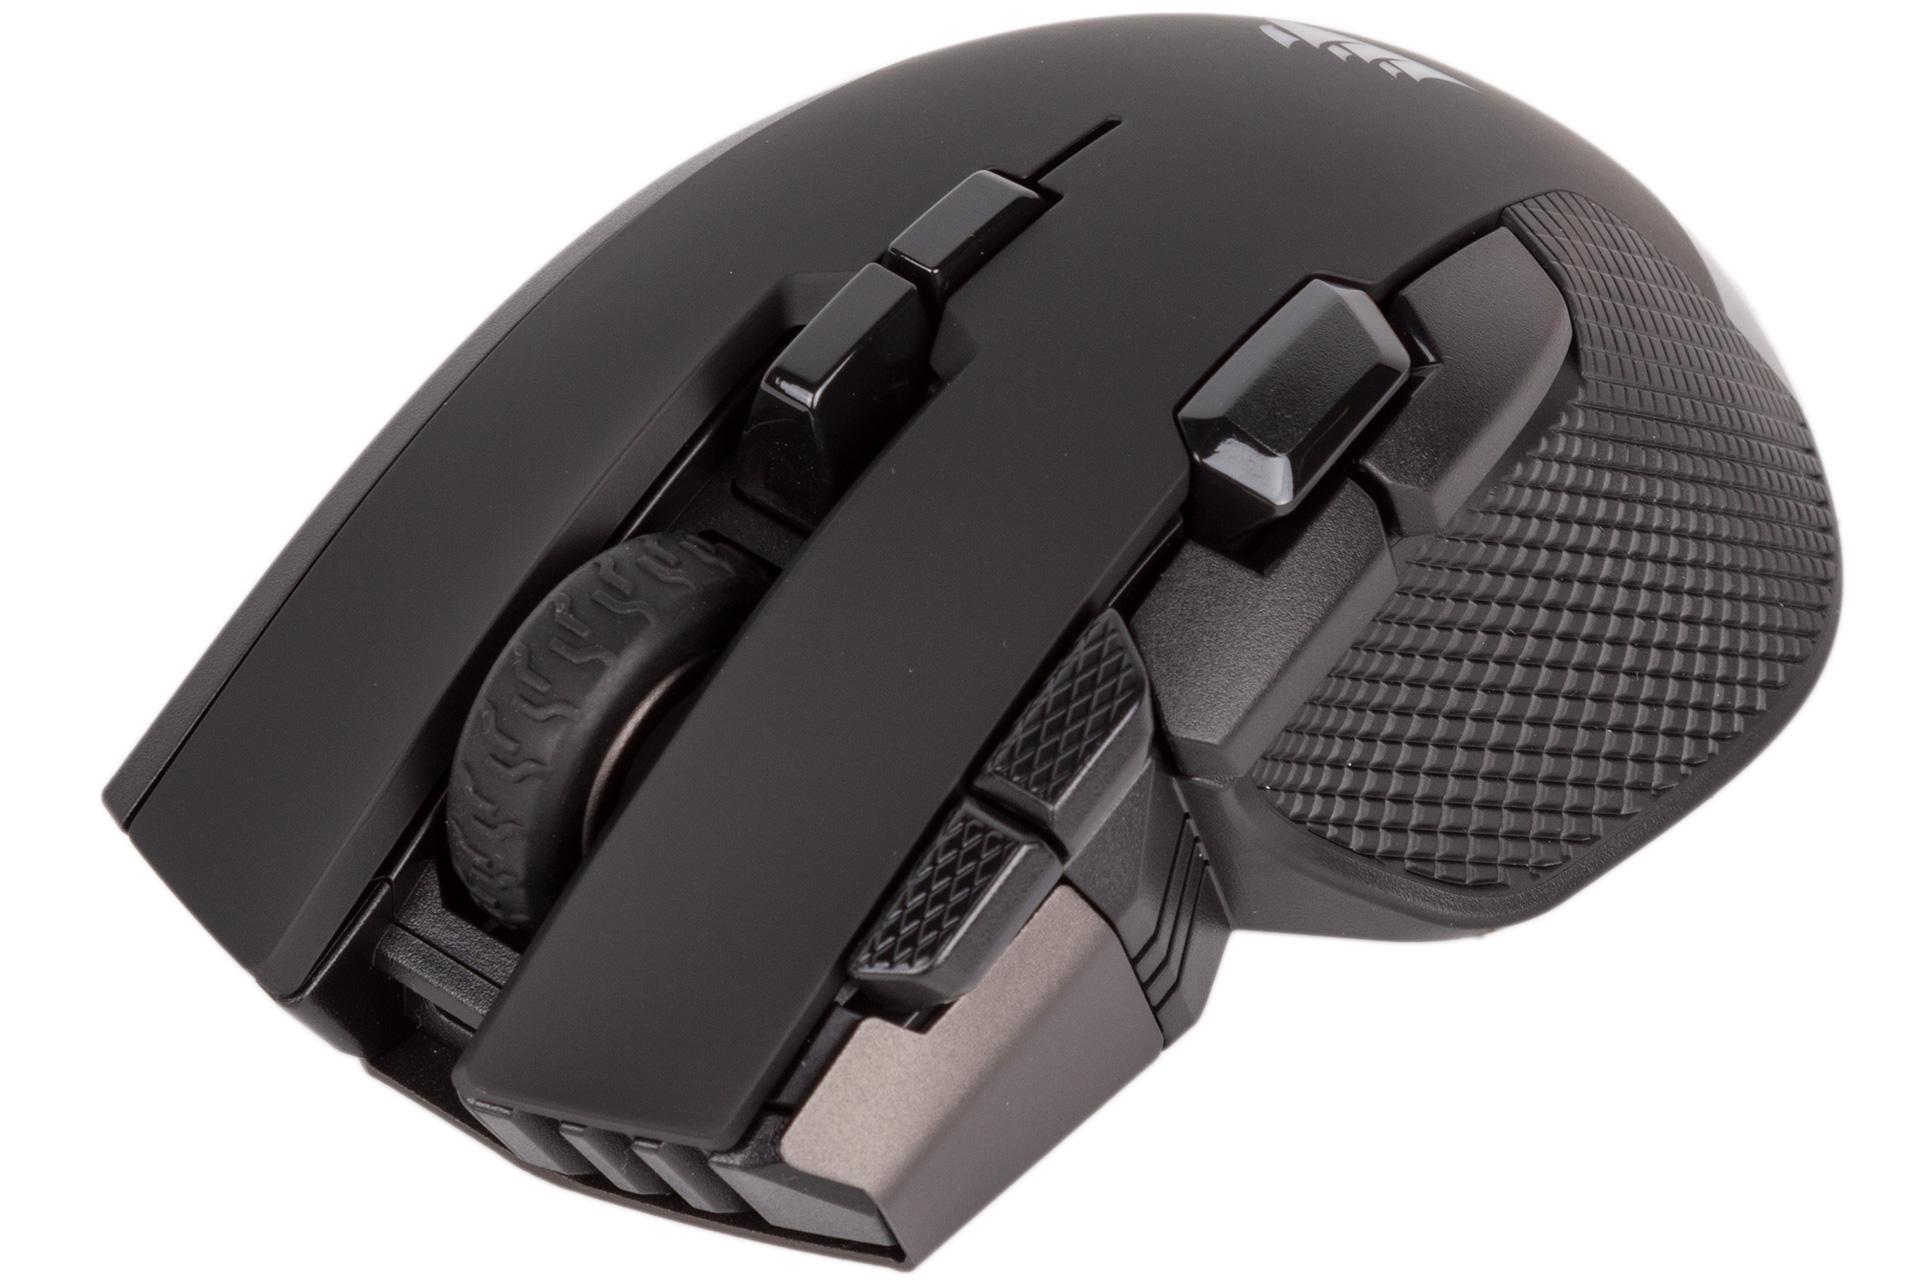 Corsair Ironclaw RGB Wireless Review   bit-tech net